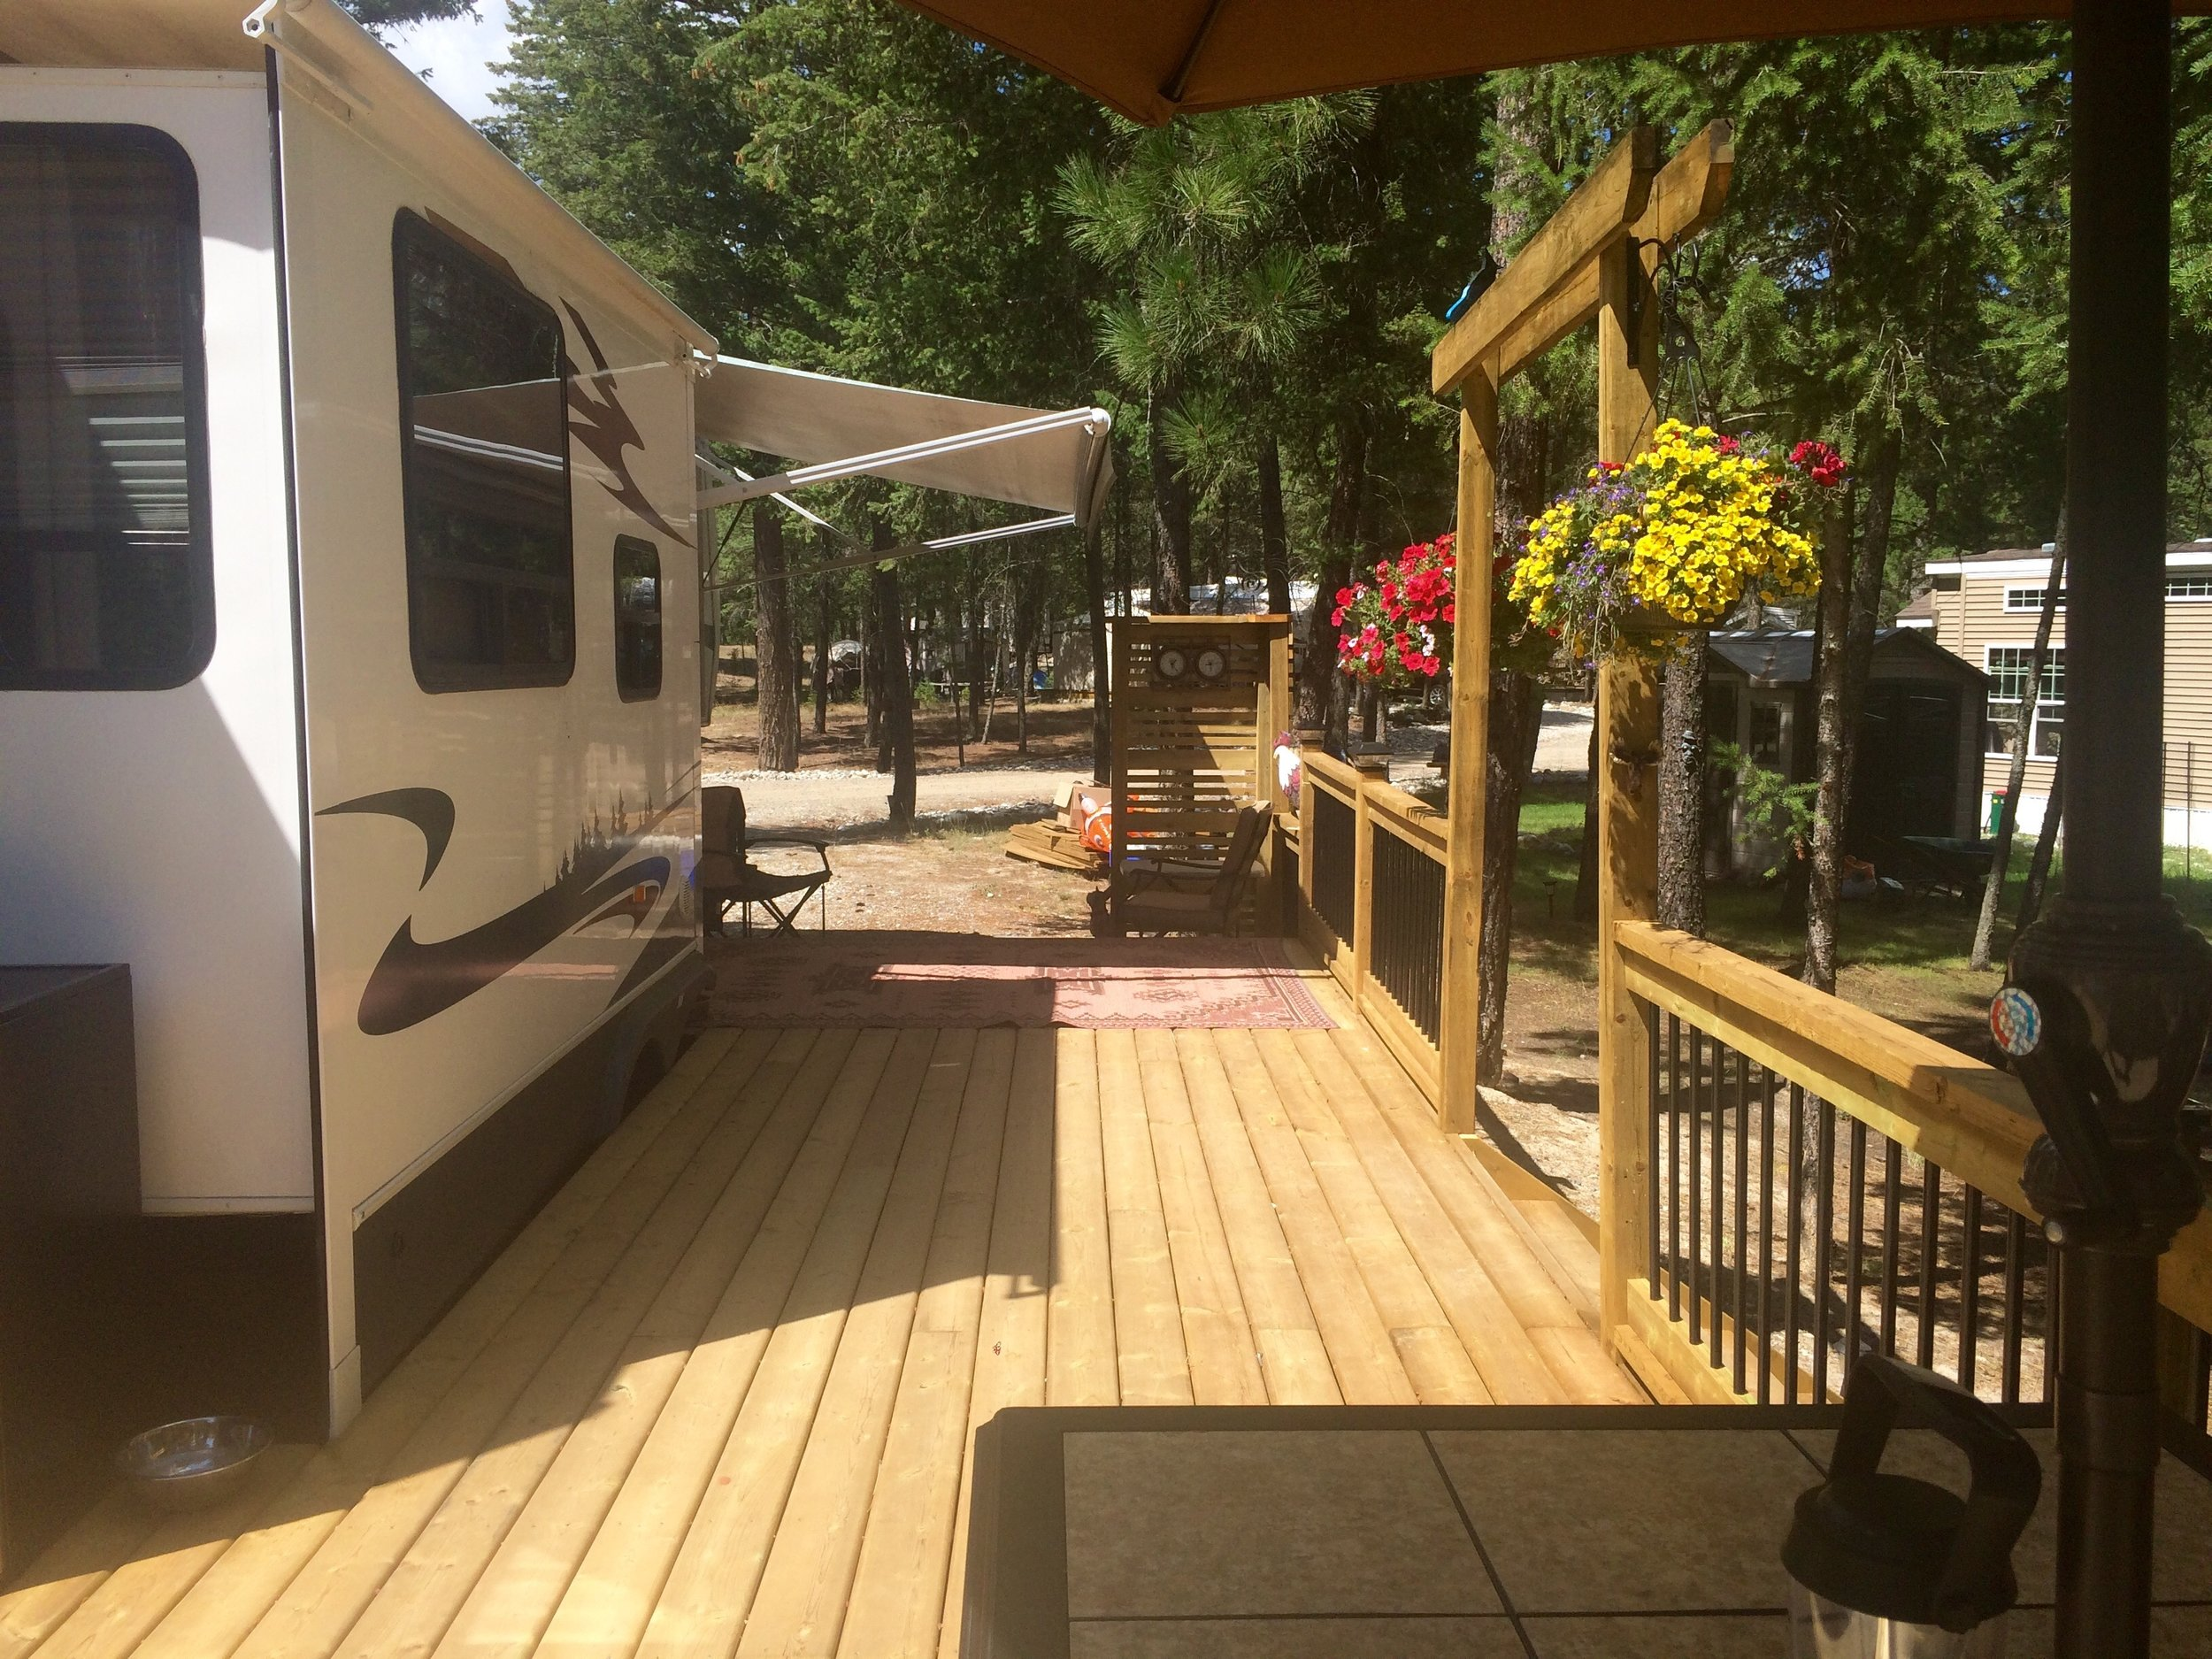 lake-koocanusa-new-deck-8.jpg